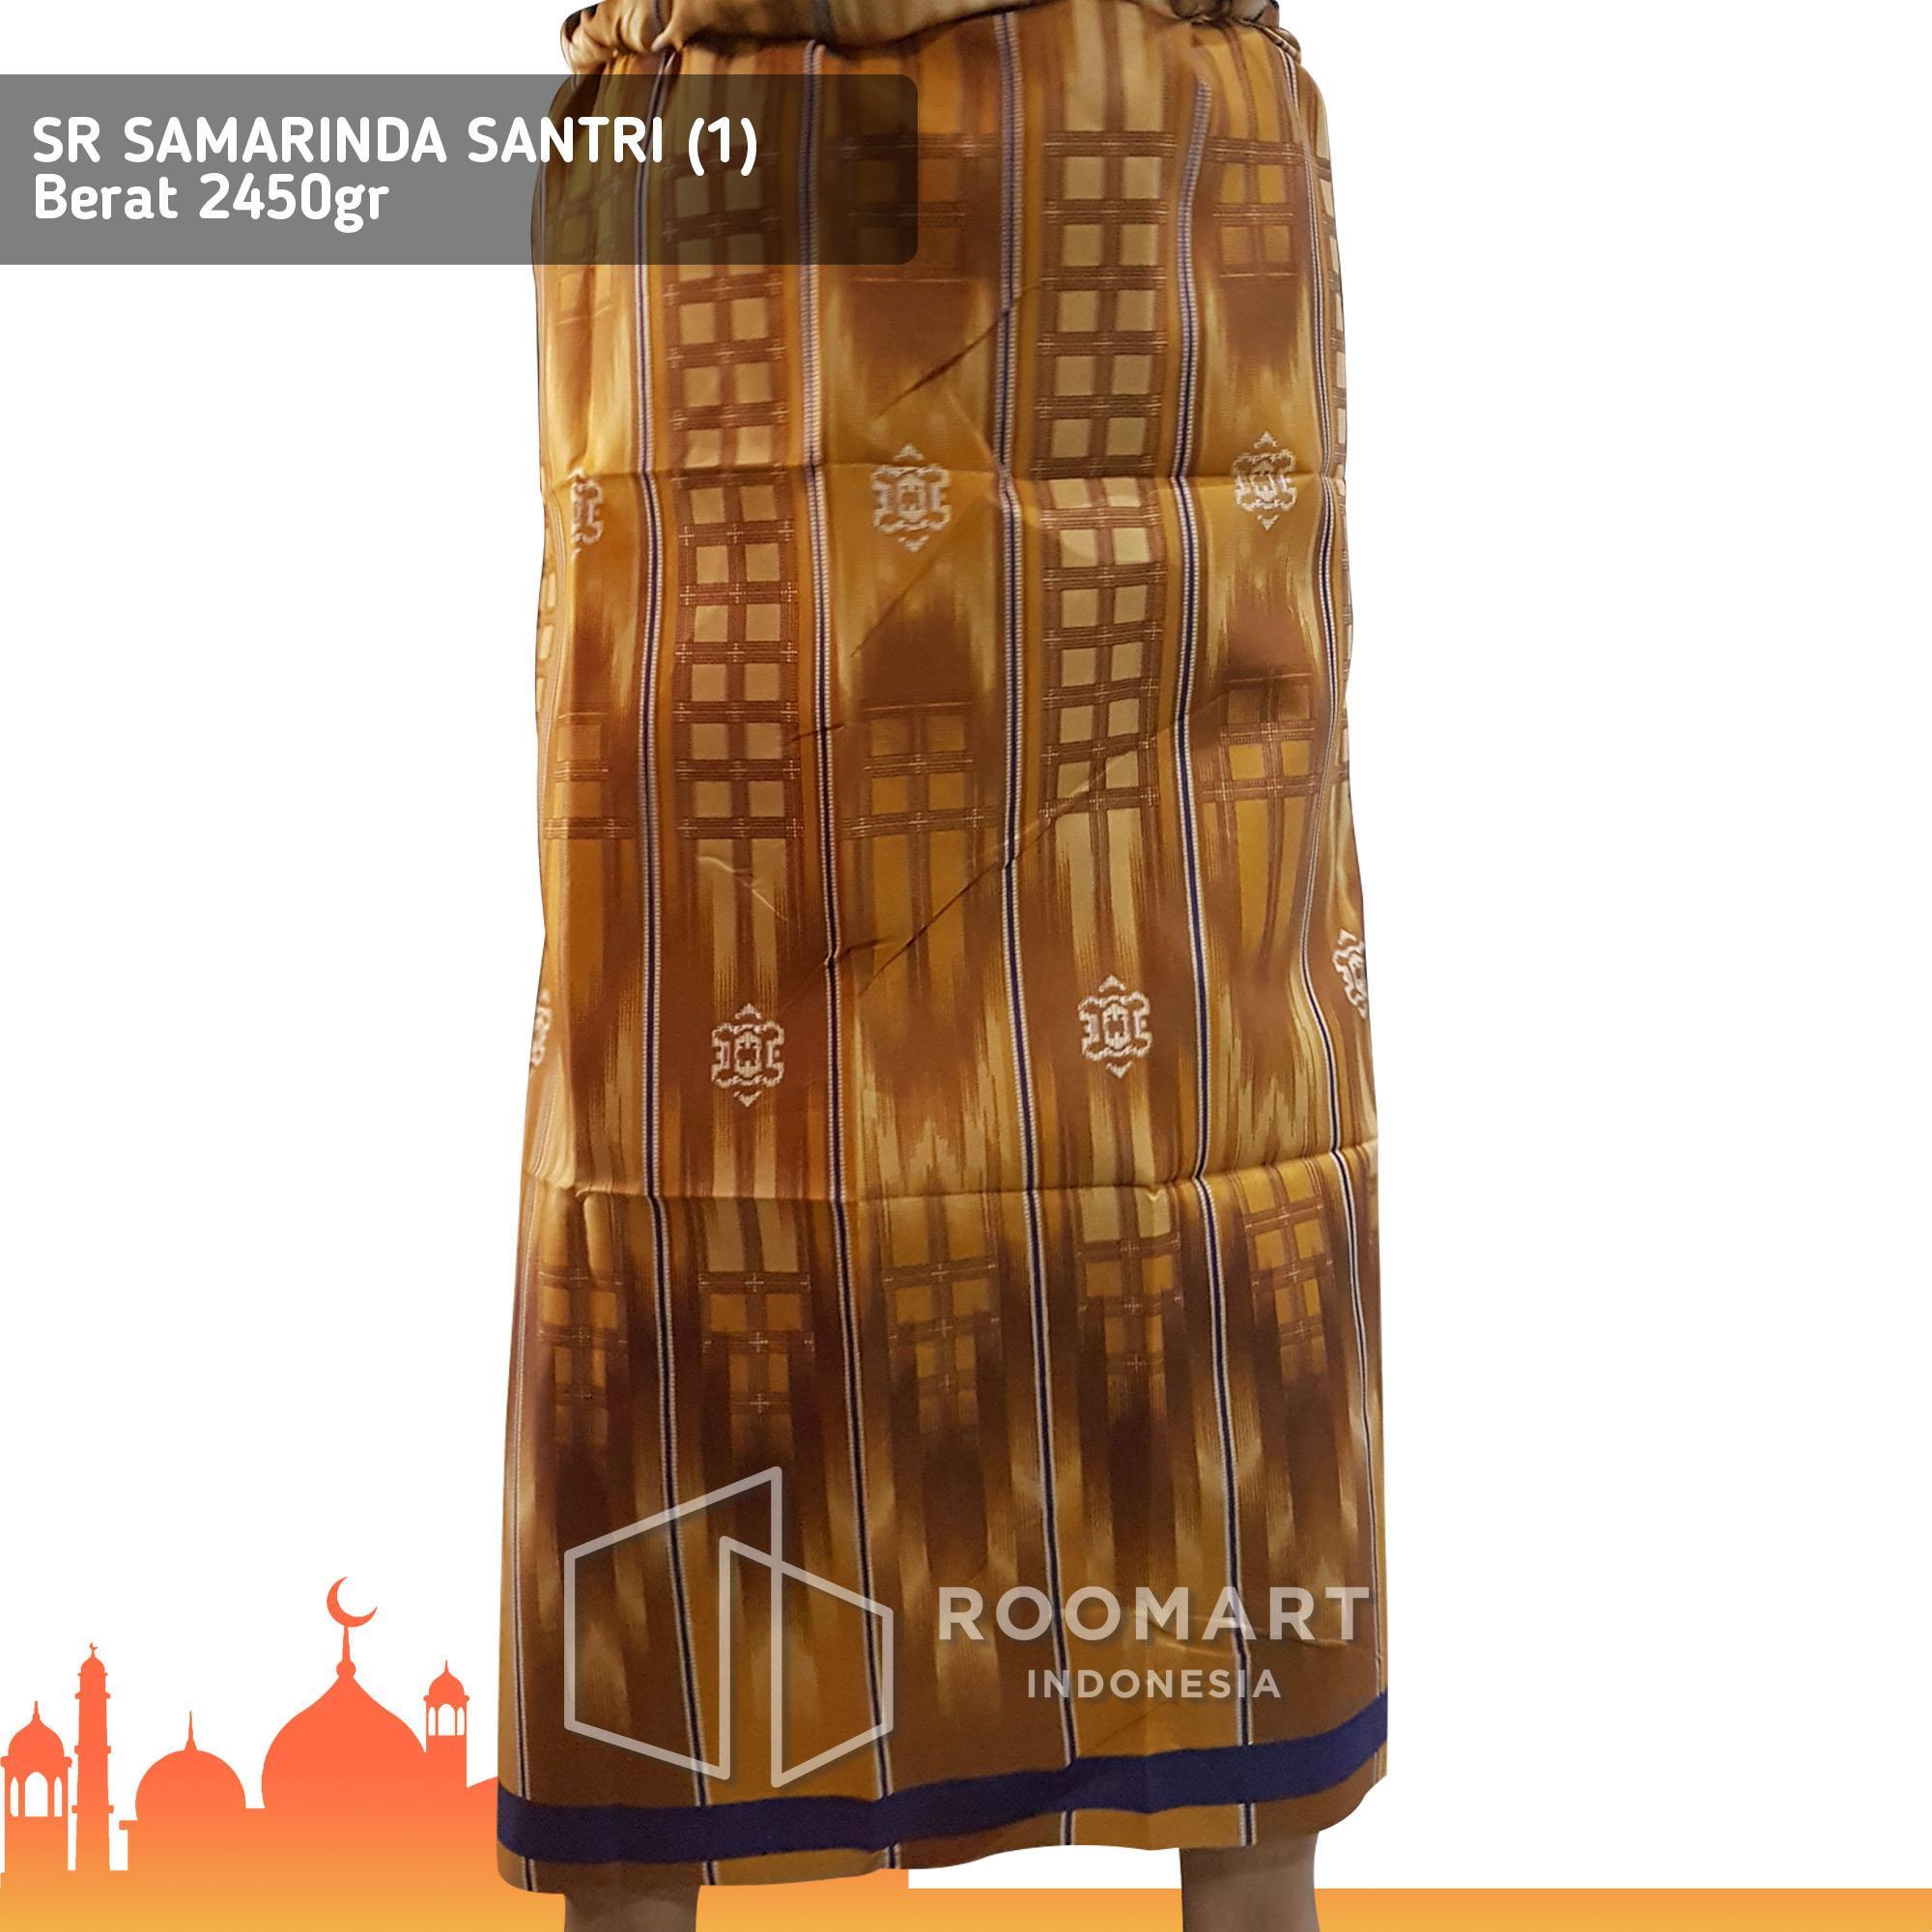 Grosir 10pcs - Sarung Samarinda Santri